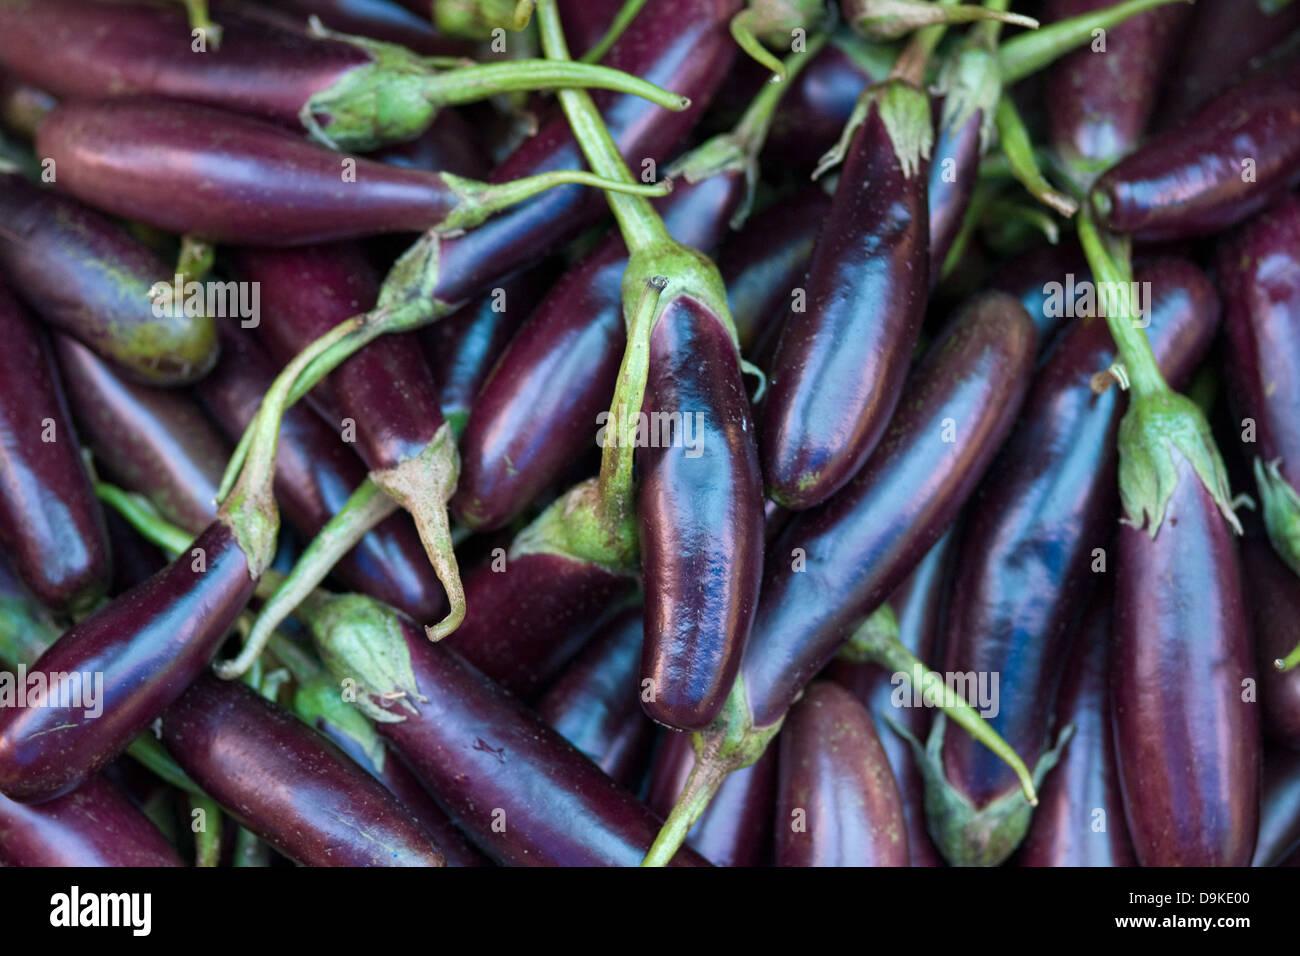 Asia, India, Karnataka, Madikeri, eggplant on the market Stock Photo